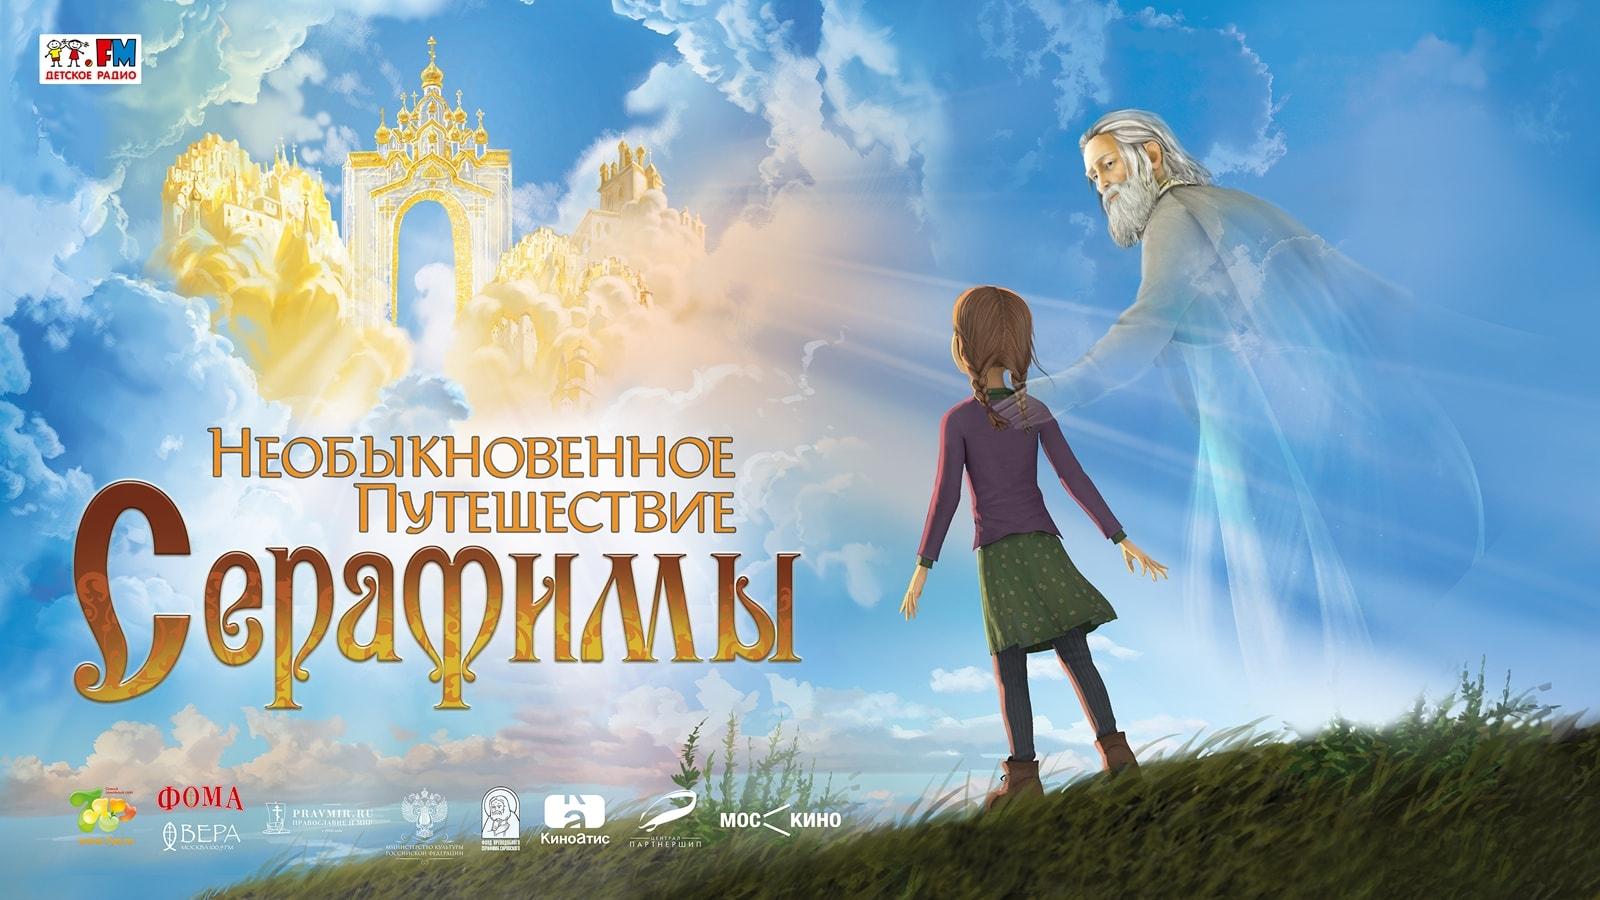 Serafim_plazma_16x9_2560_-_Copy(3)